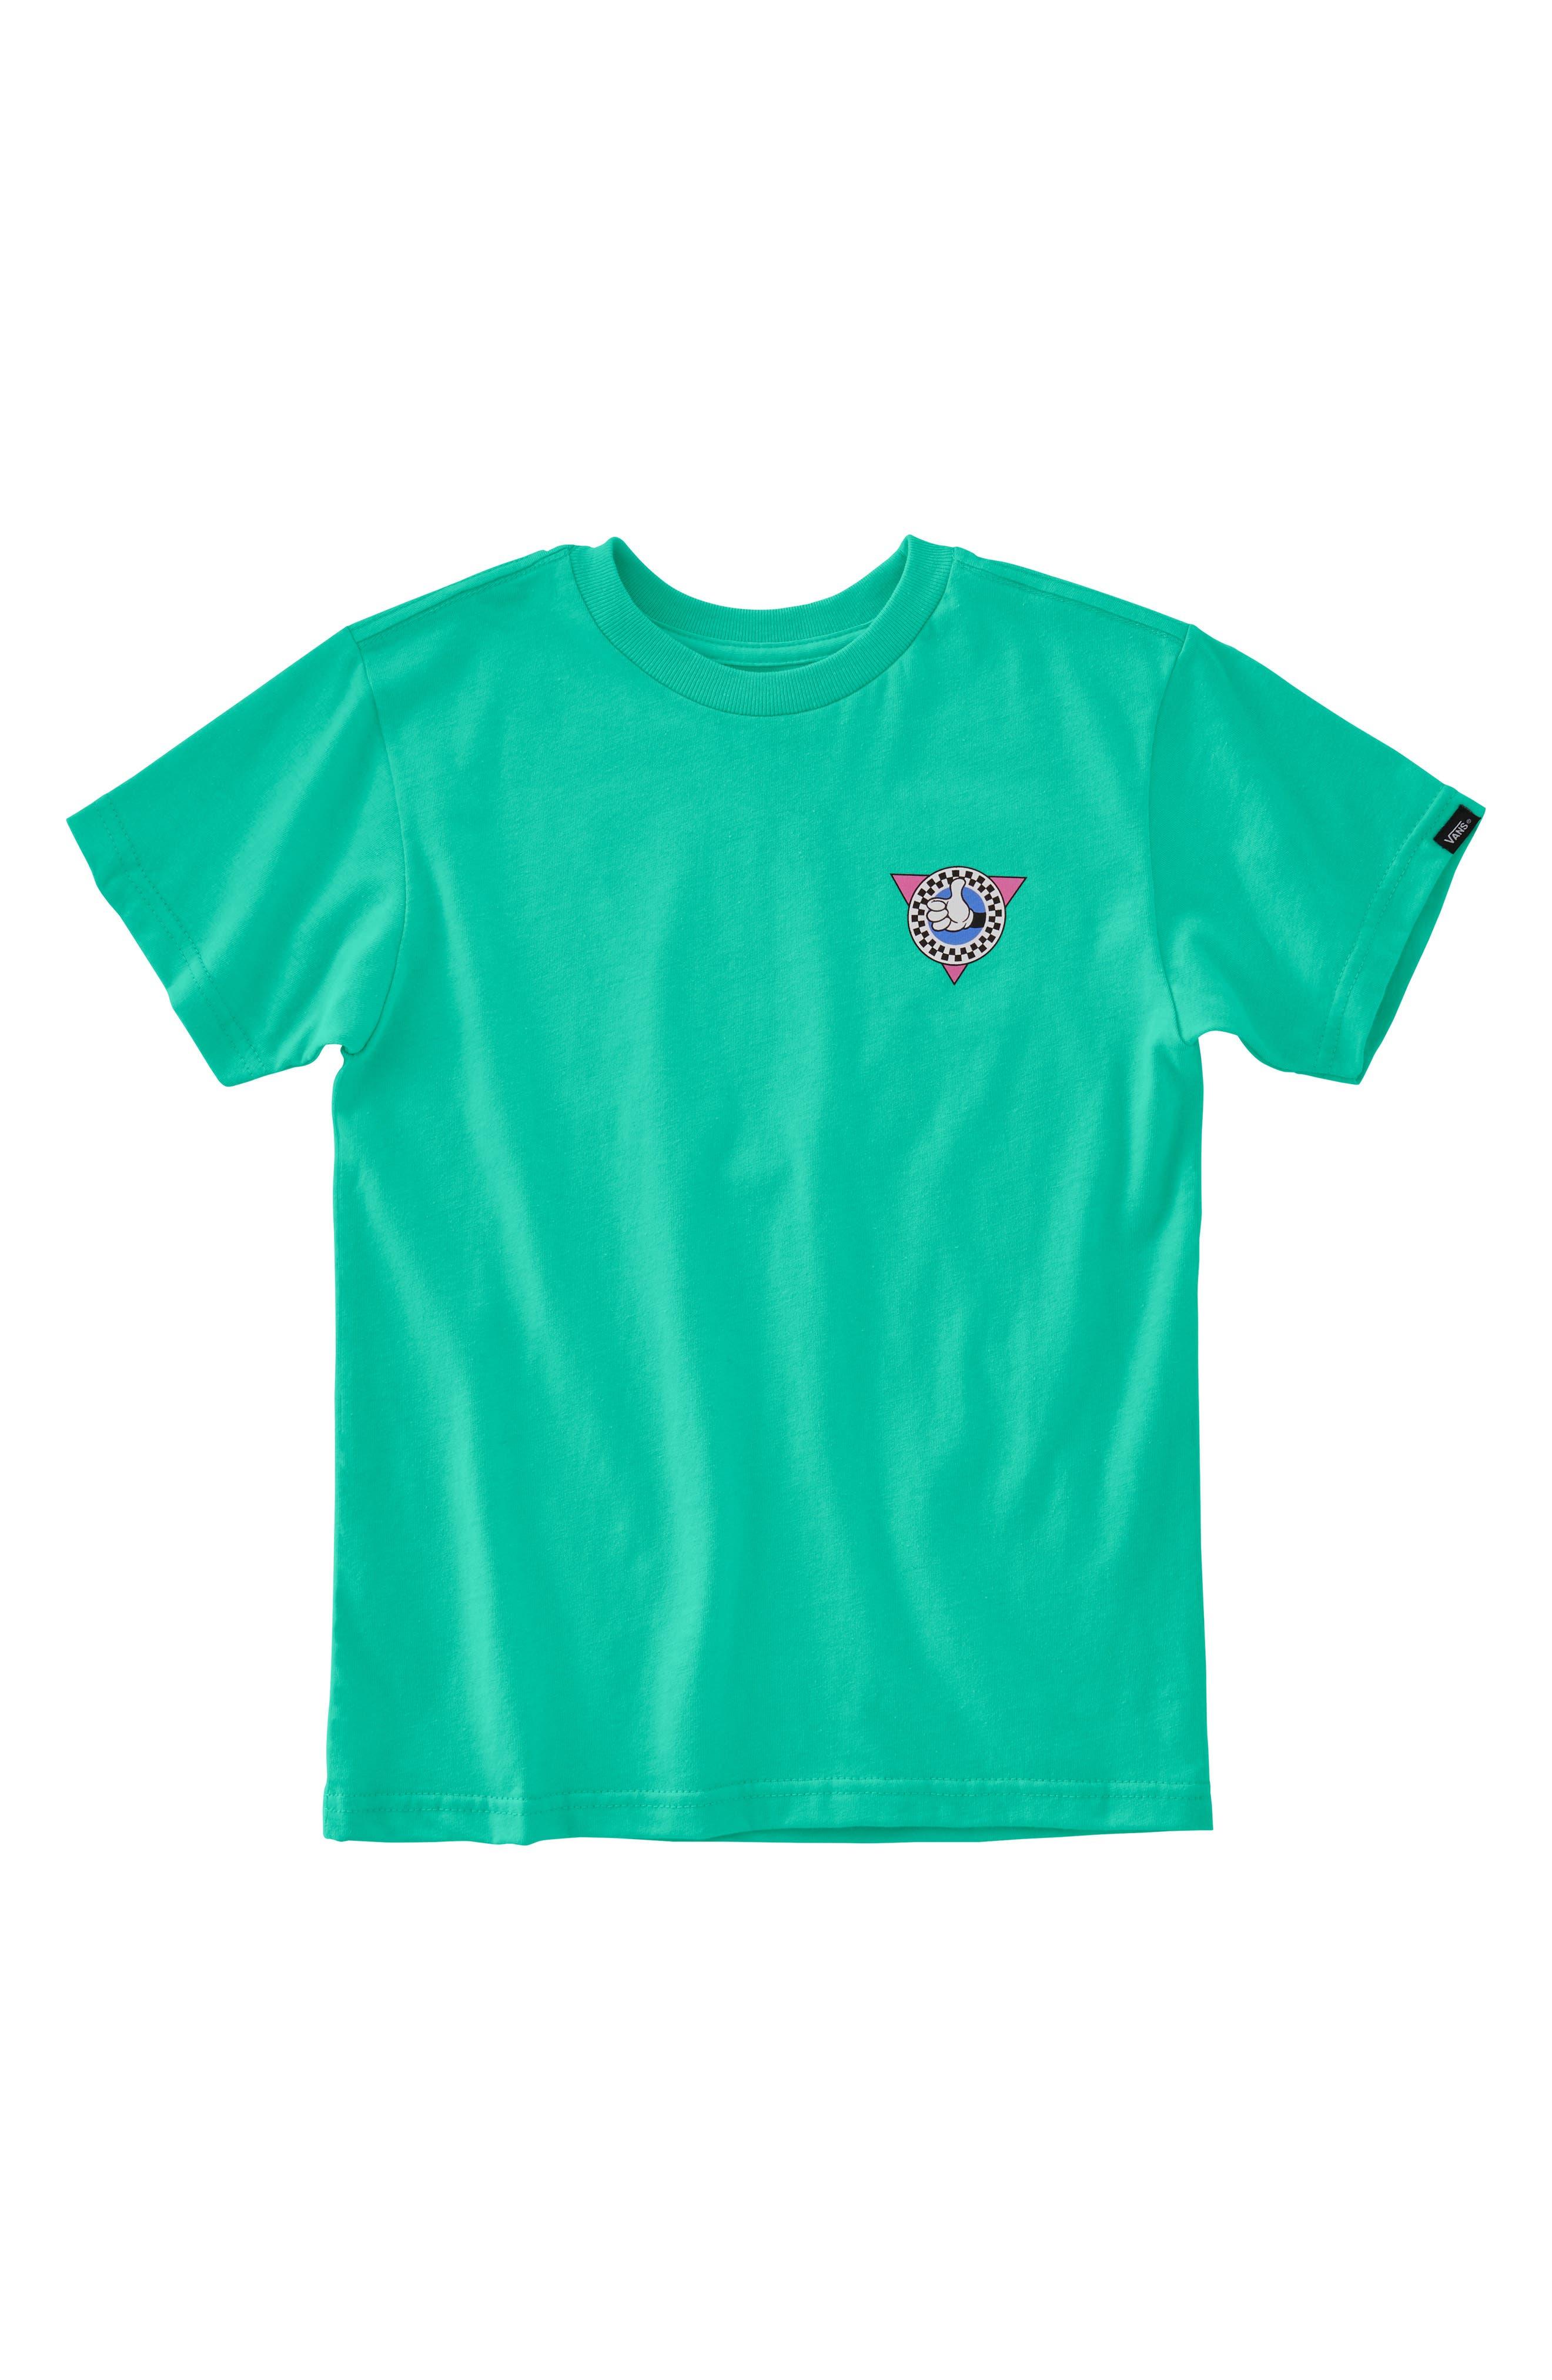 x Disney Mickey's 90th Anniversary Classic T-Shirt,                             Main thumbnail 1, color,                             300